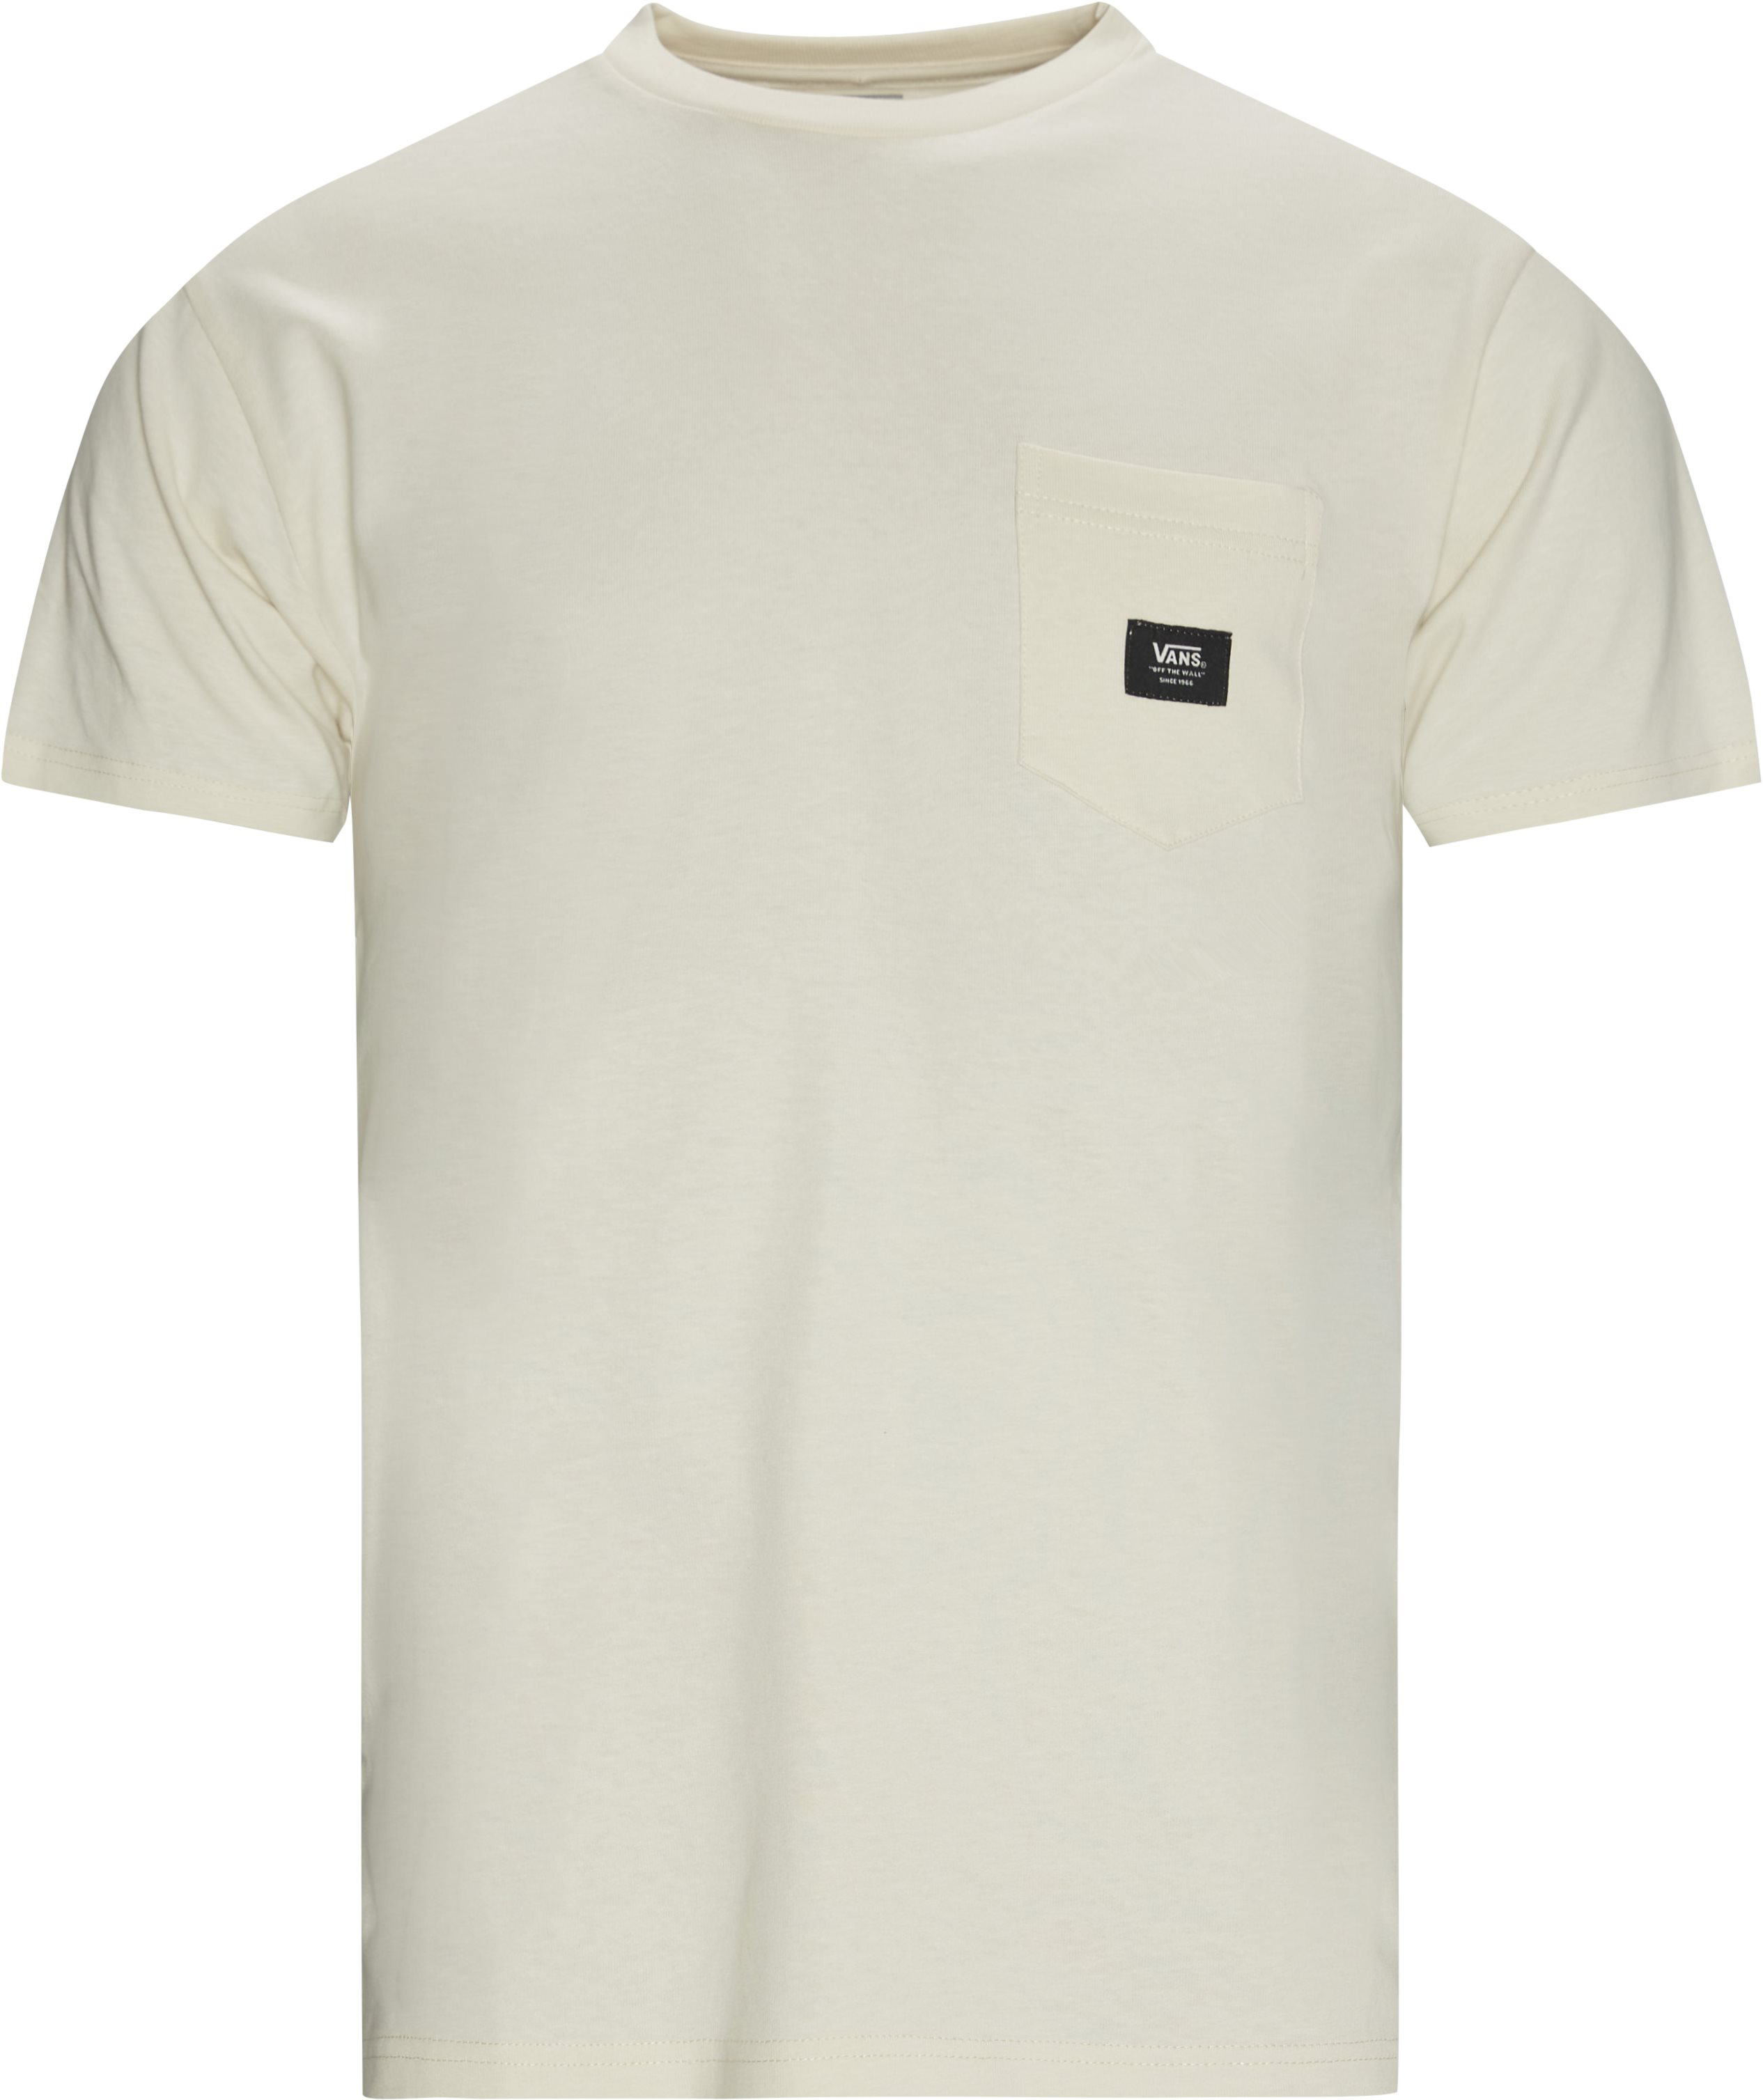 Woven Pocket Tee - T-shirts - Regular fit - Hvid